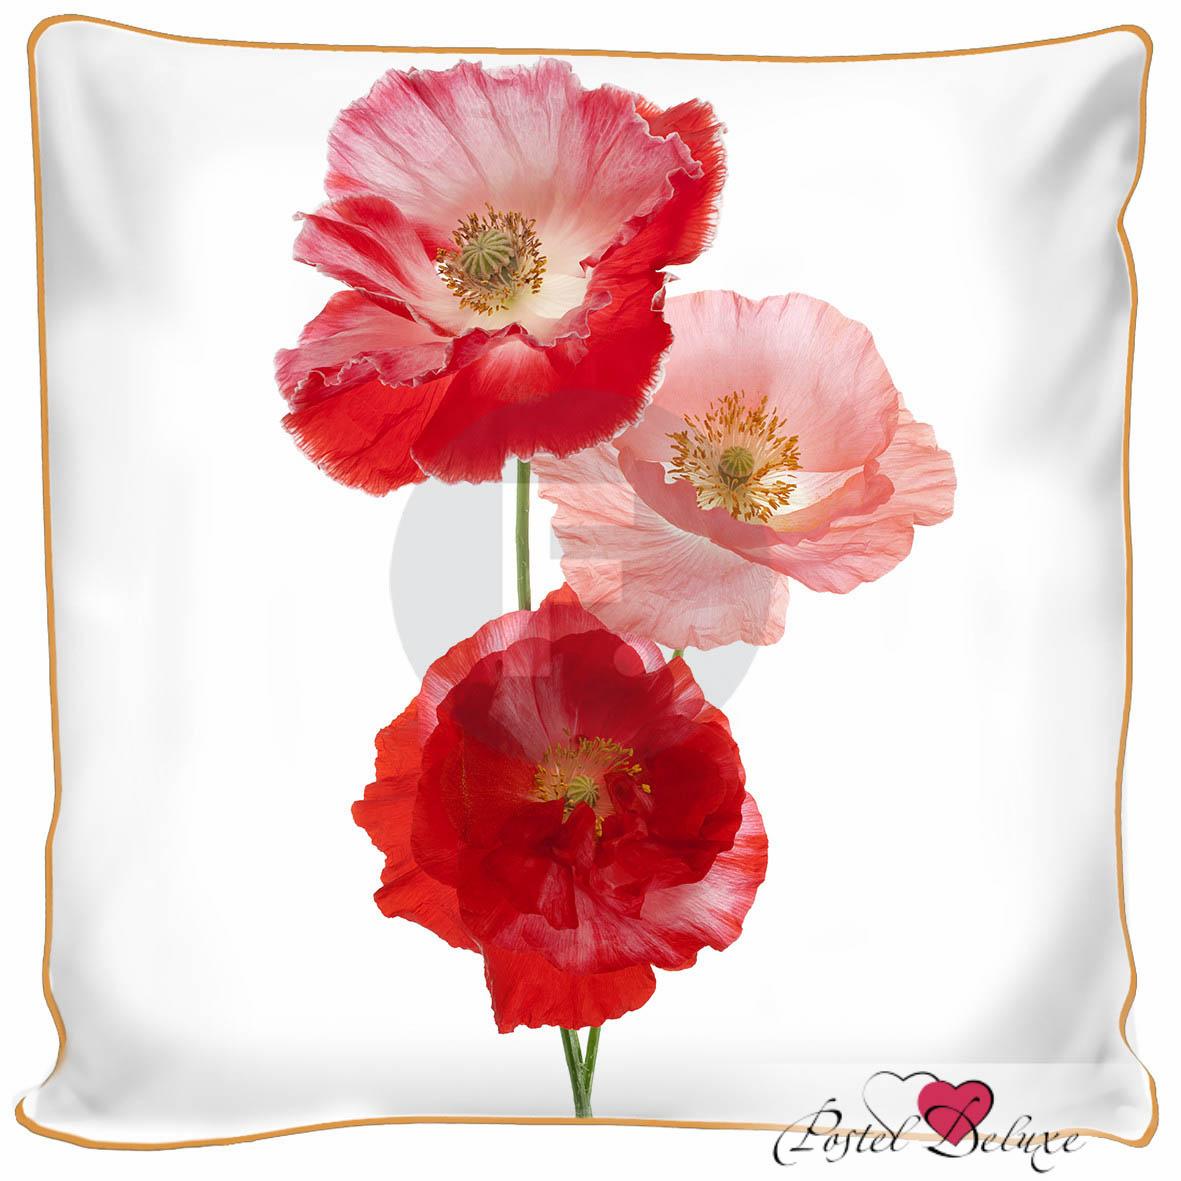 Декоративные подушки Fototende Декоративная подушка Нежные Цветы (45х45) подушка арти м декоративная 45х45 см цветы 703 694 37